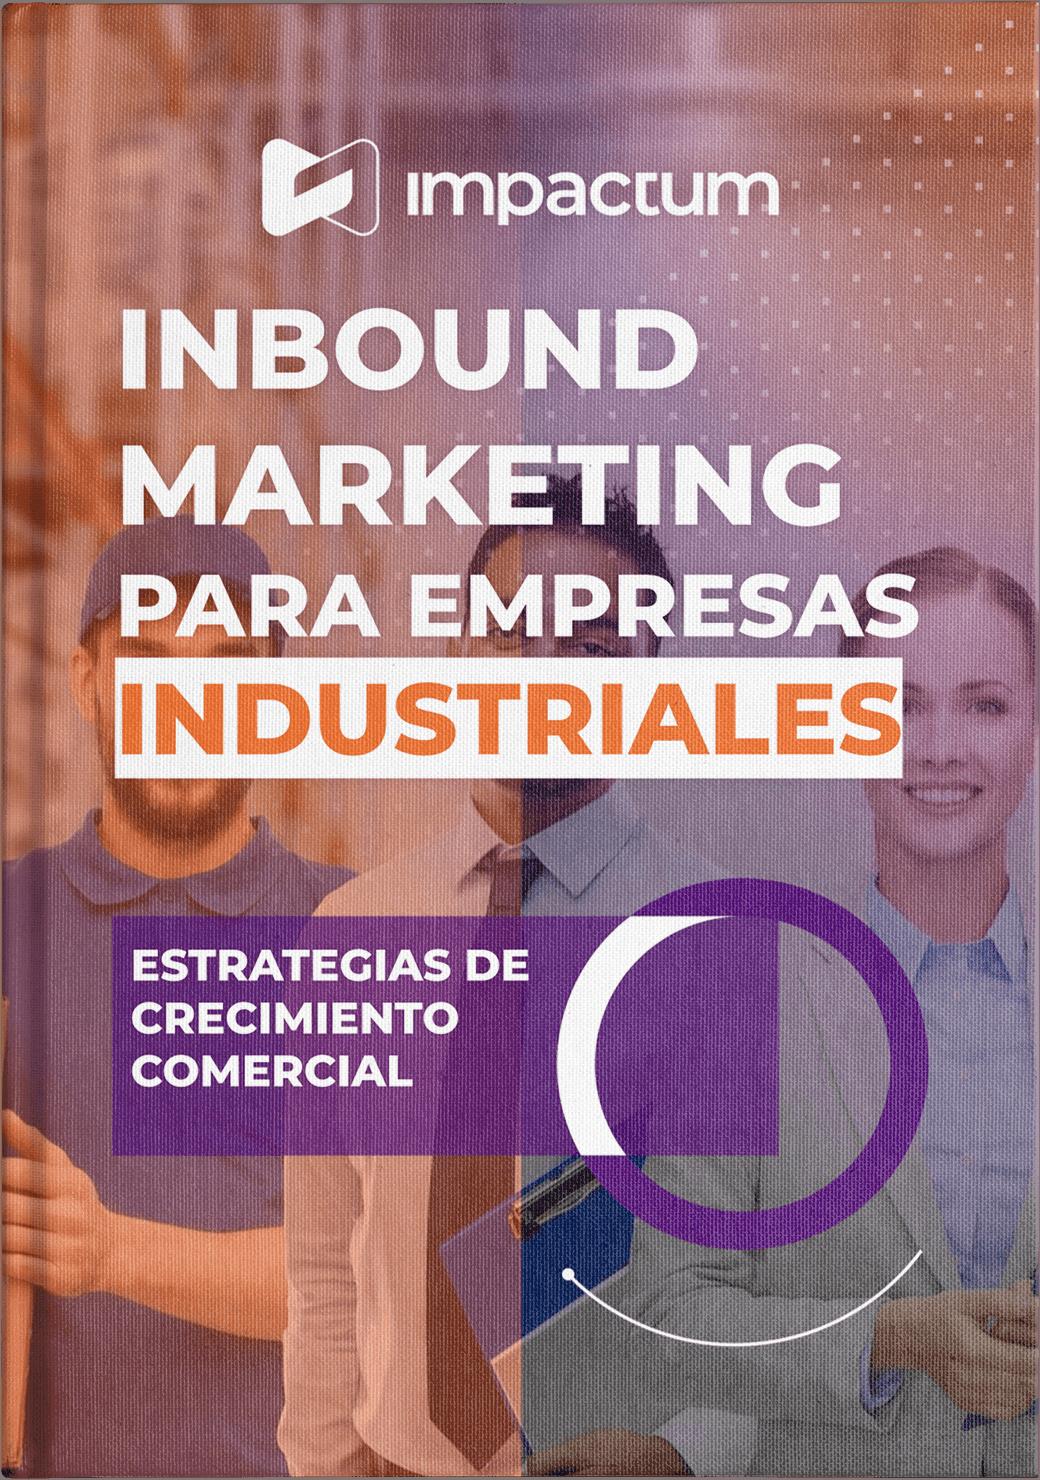 inbound marketing para empresas industriales